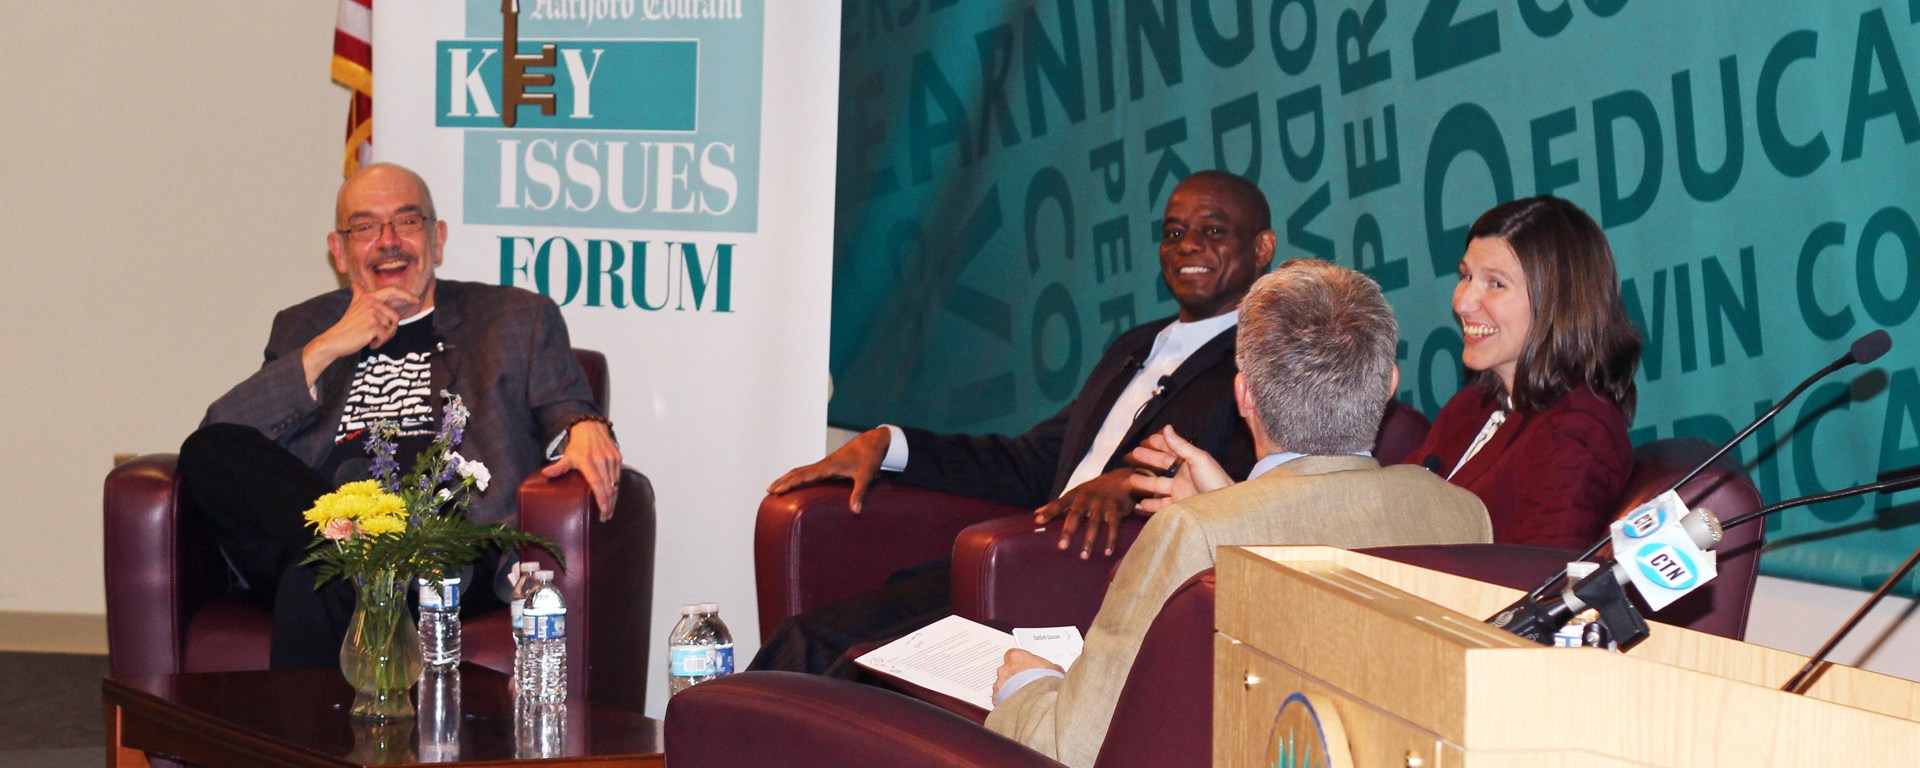 key-issues-forum-1